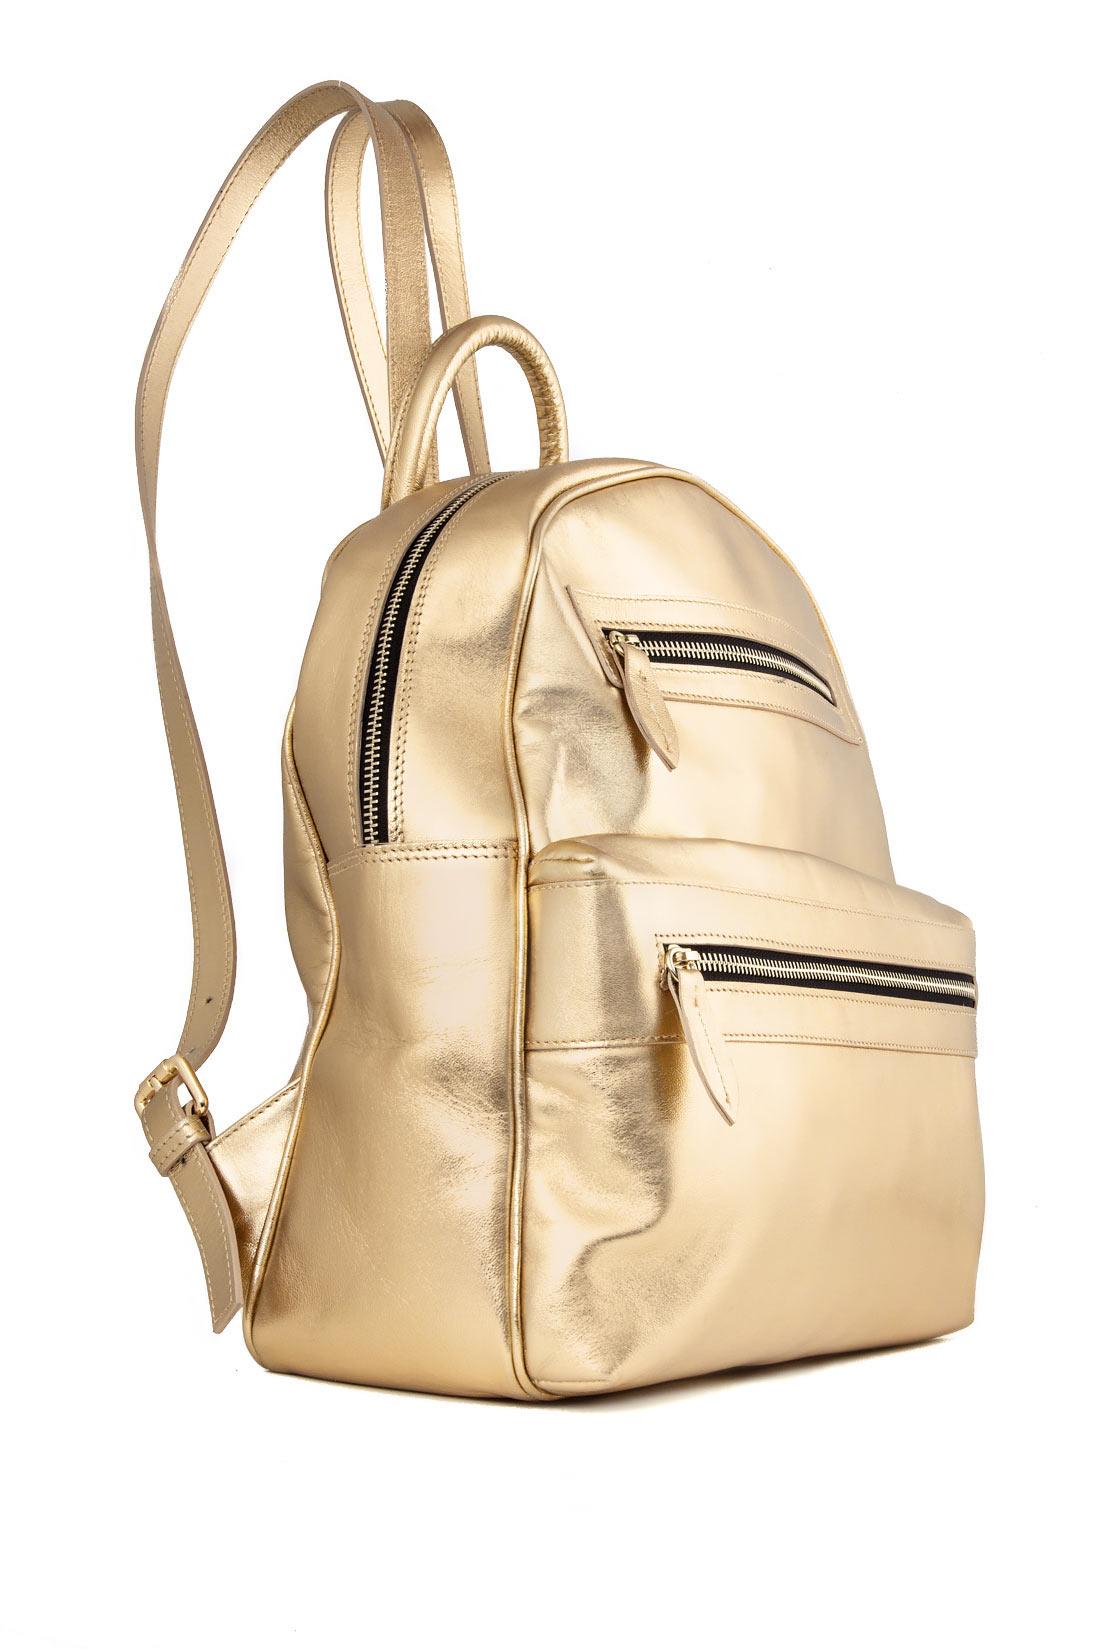 Metallic leather backpack Laura Olaru image 1